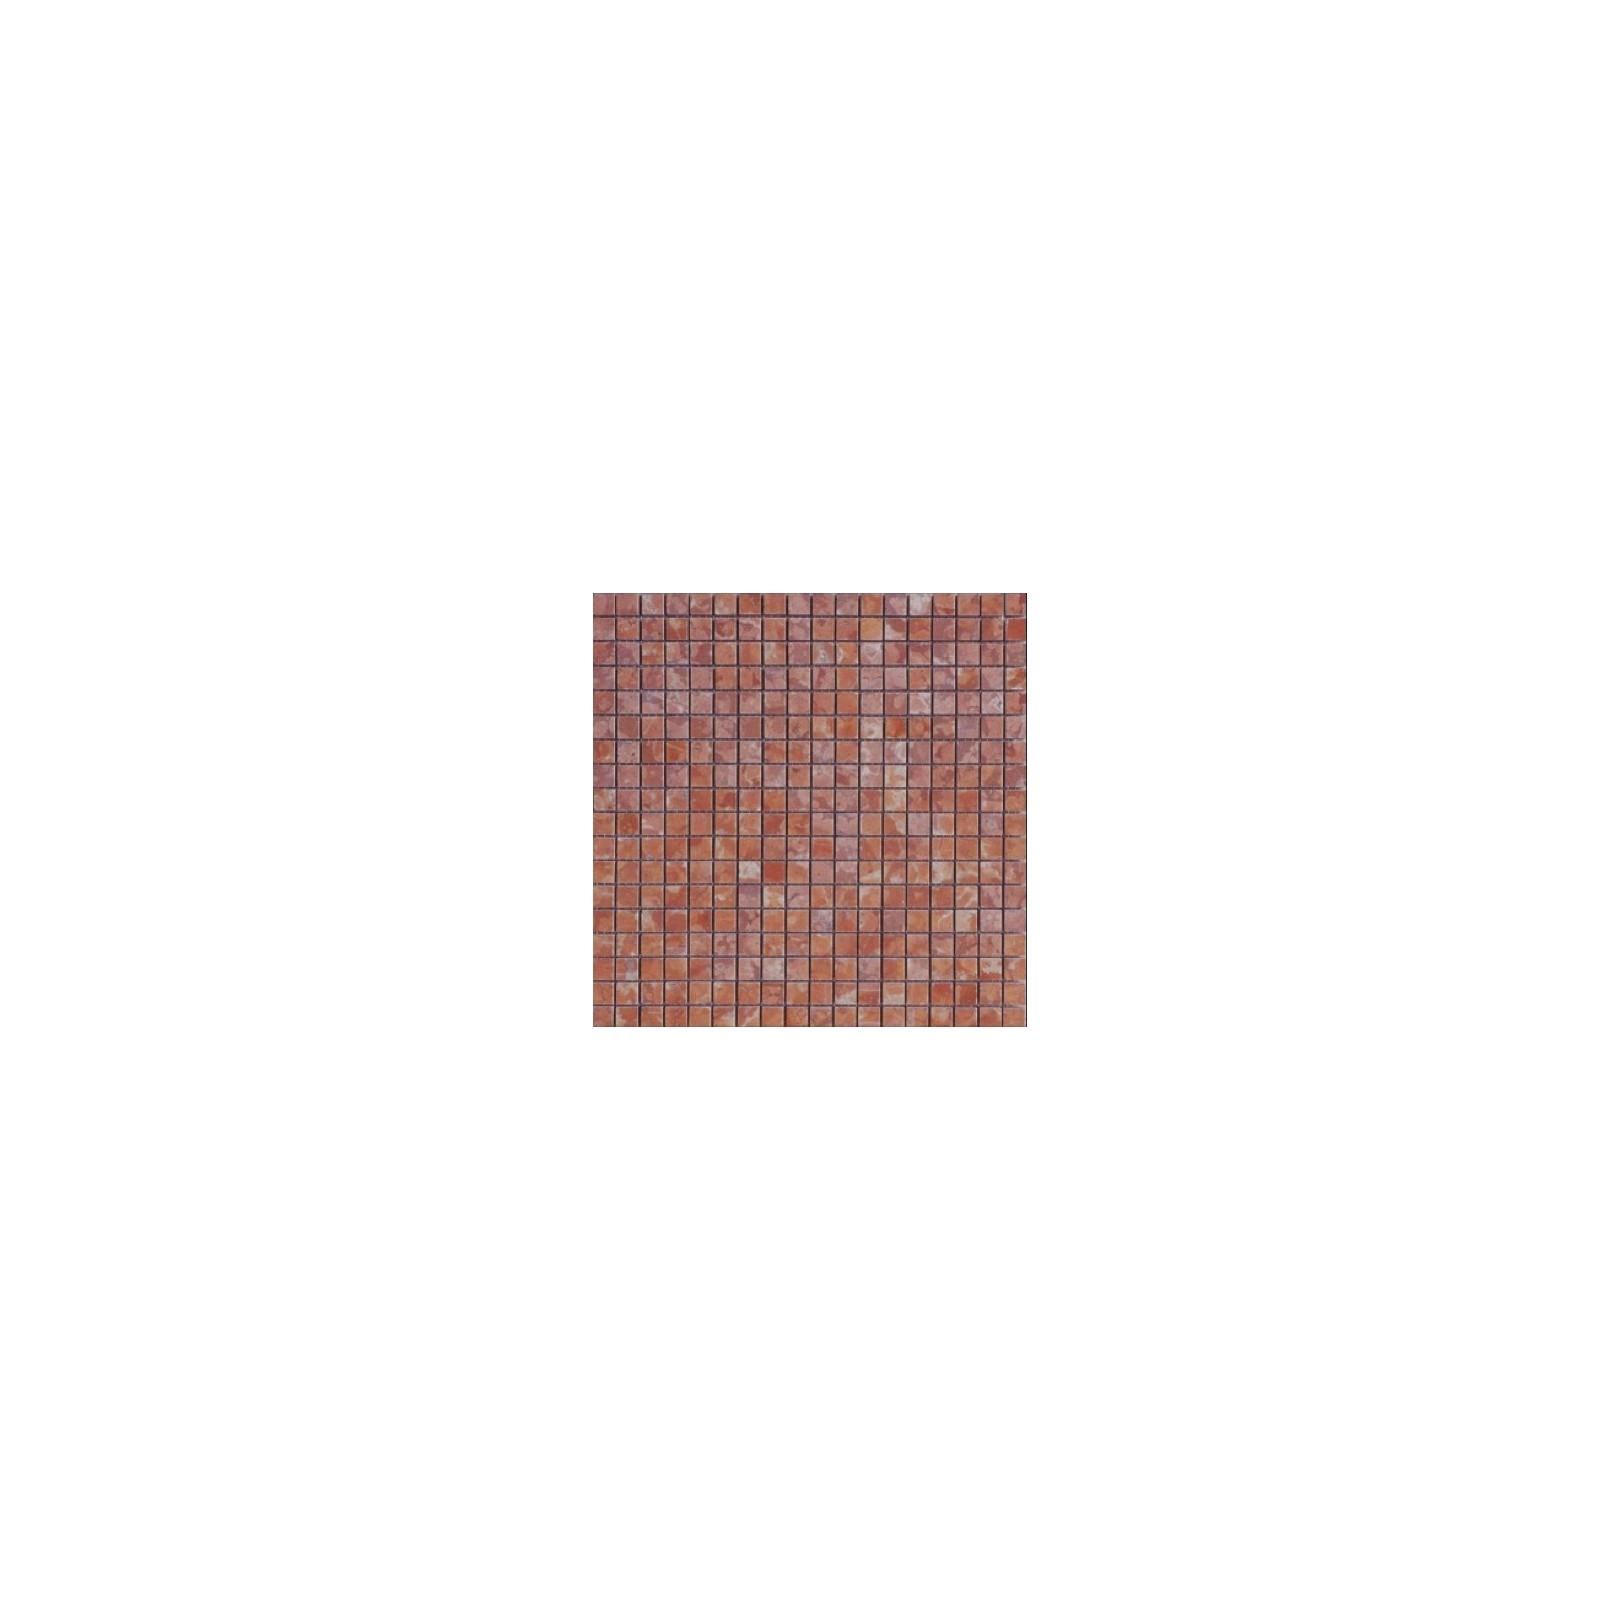 Mosaïque marbre Rosso Verona, 1,5x1,5cm sur trame 29,6x29,6cm